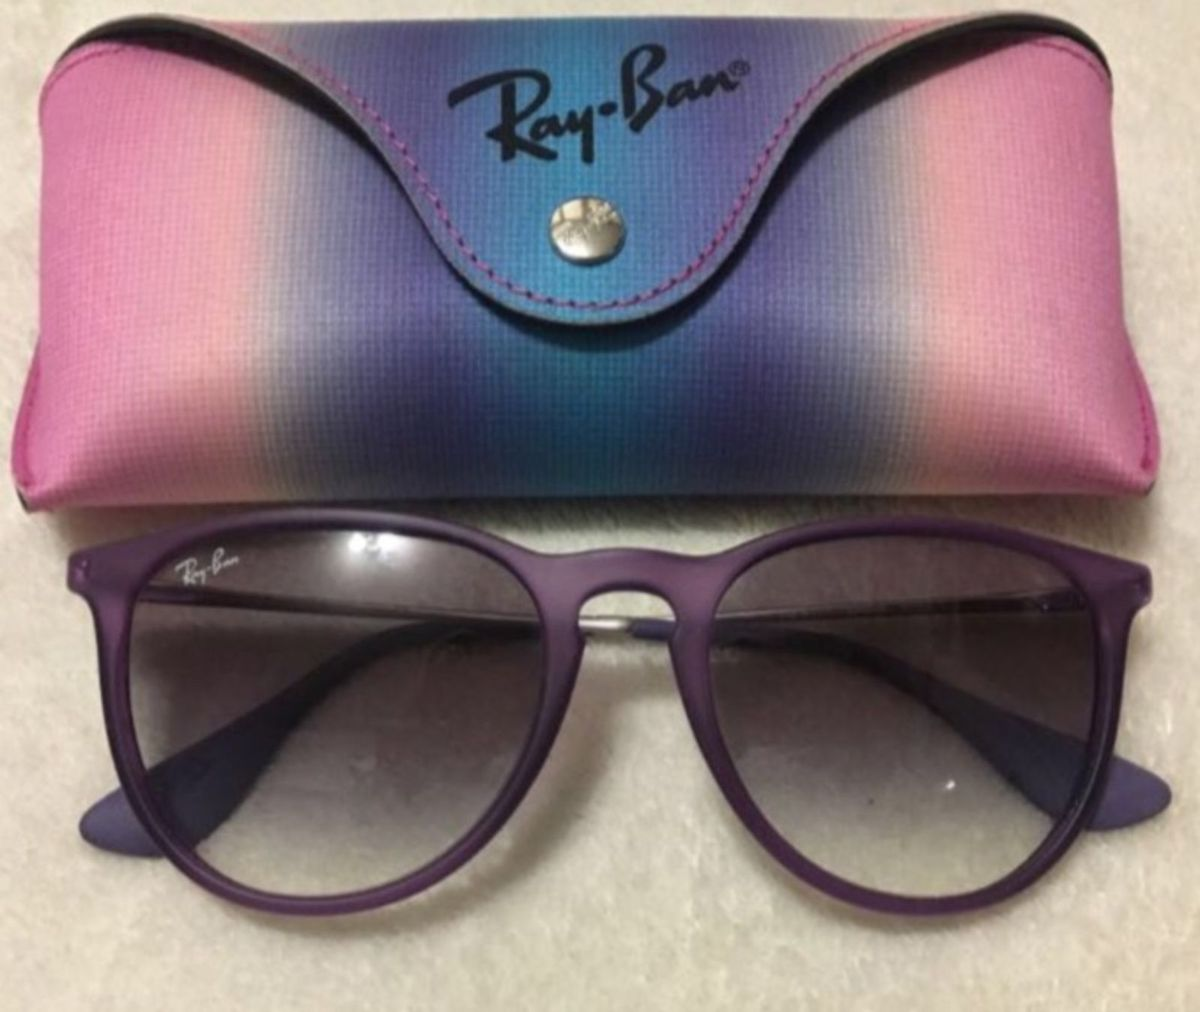 ray-ban roxo - óculos ray-ban.  Czm6ly9wag90b3muzw5qb2vplmnvbs5ici9wcm9kdwn0cy84ndc2mji5l2vmodmynme2njdlyznmztkzzjjin2u4mjdhotjkzmuzlmpwzw  ... ad23d6befb